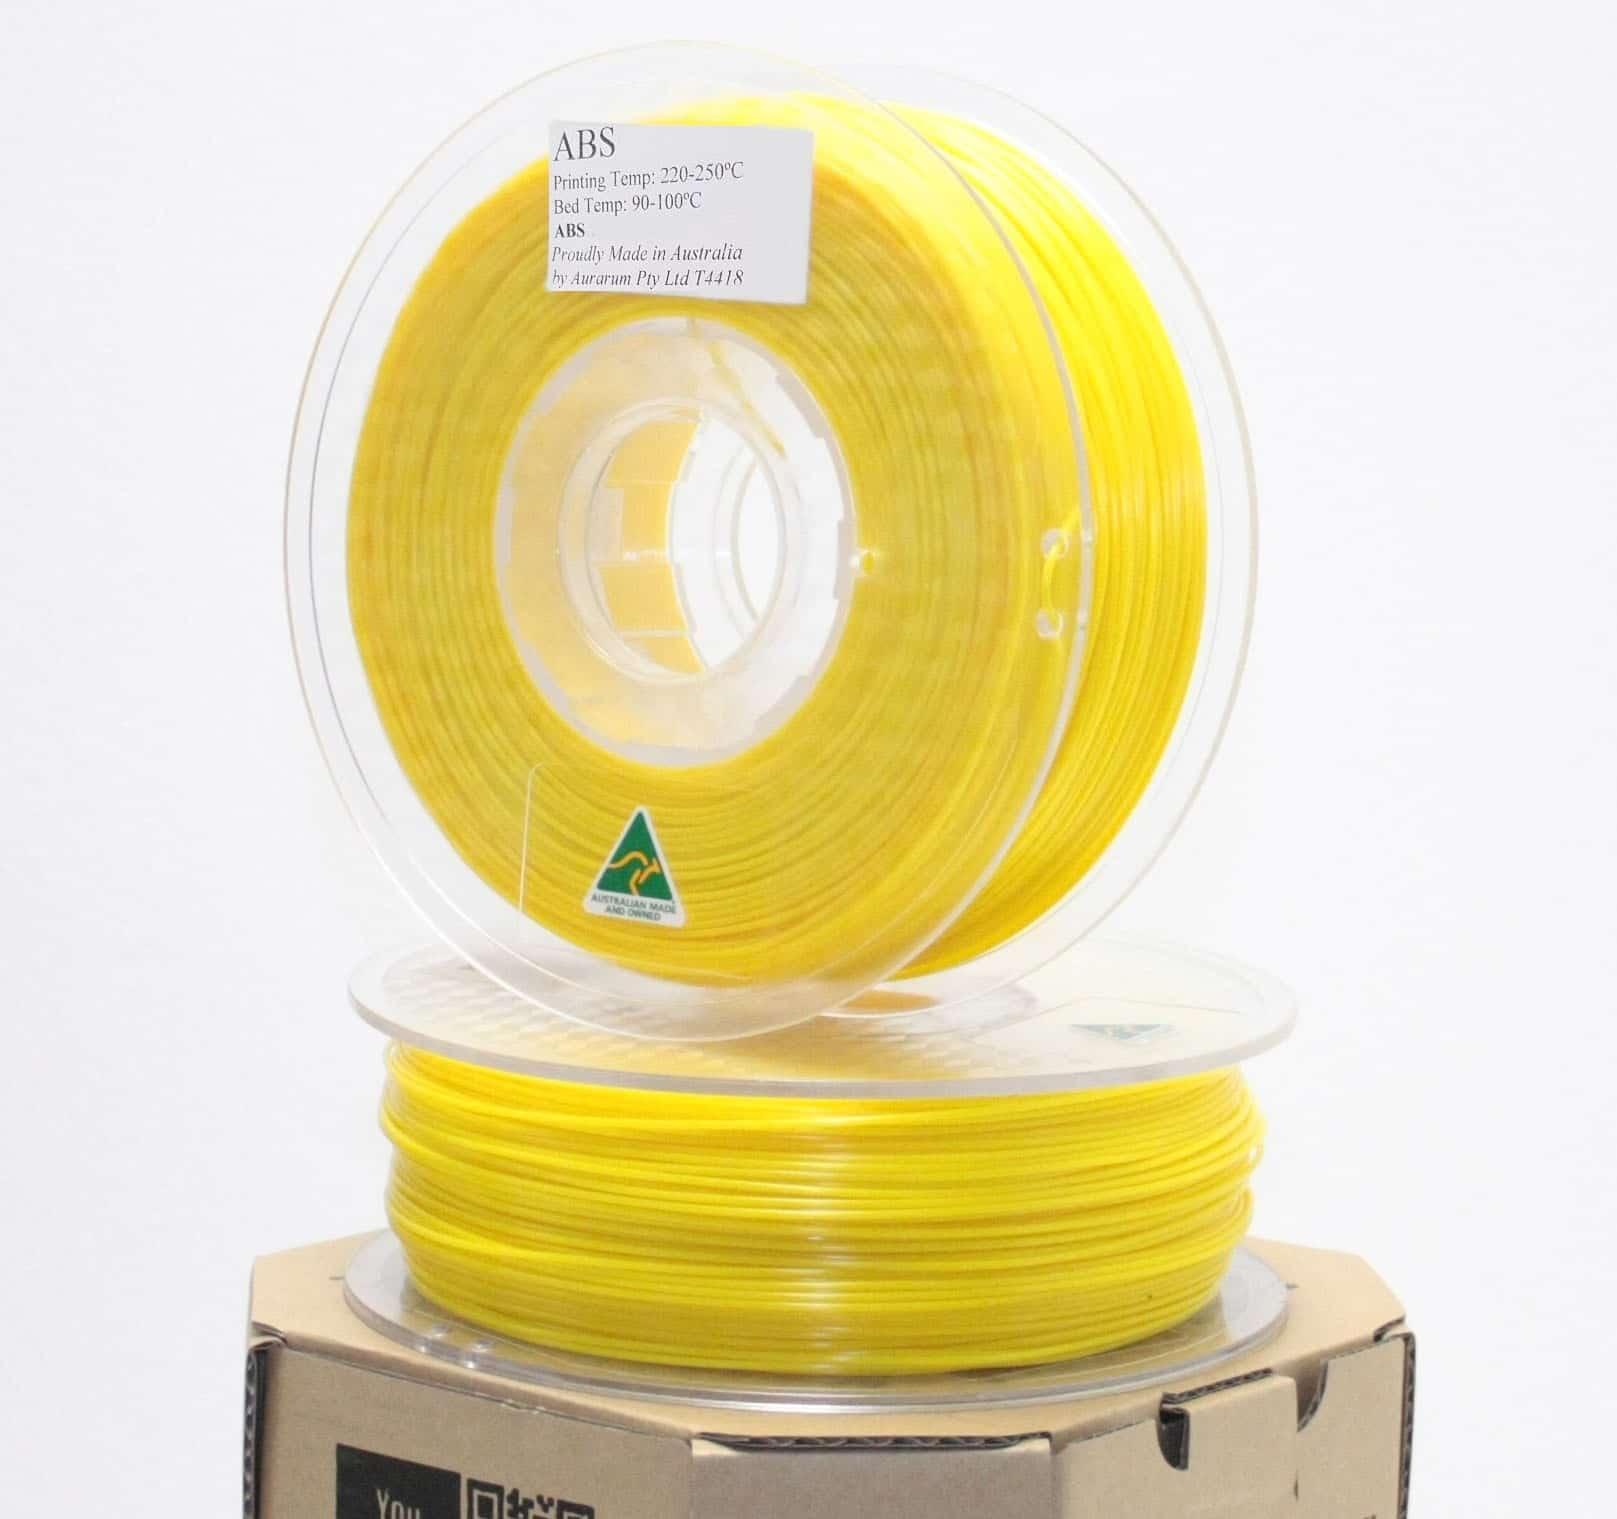 Aurarum ABS 3D Printer Filament - Yellow 2.85mm 1Kg